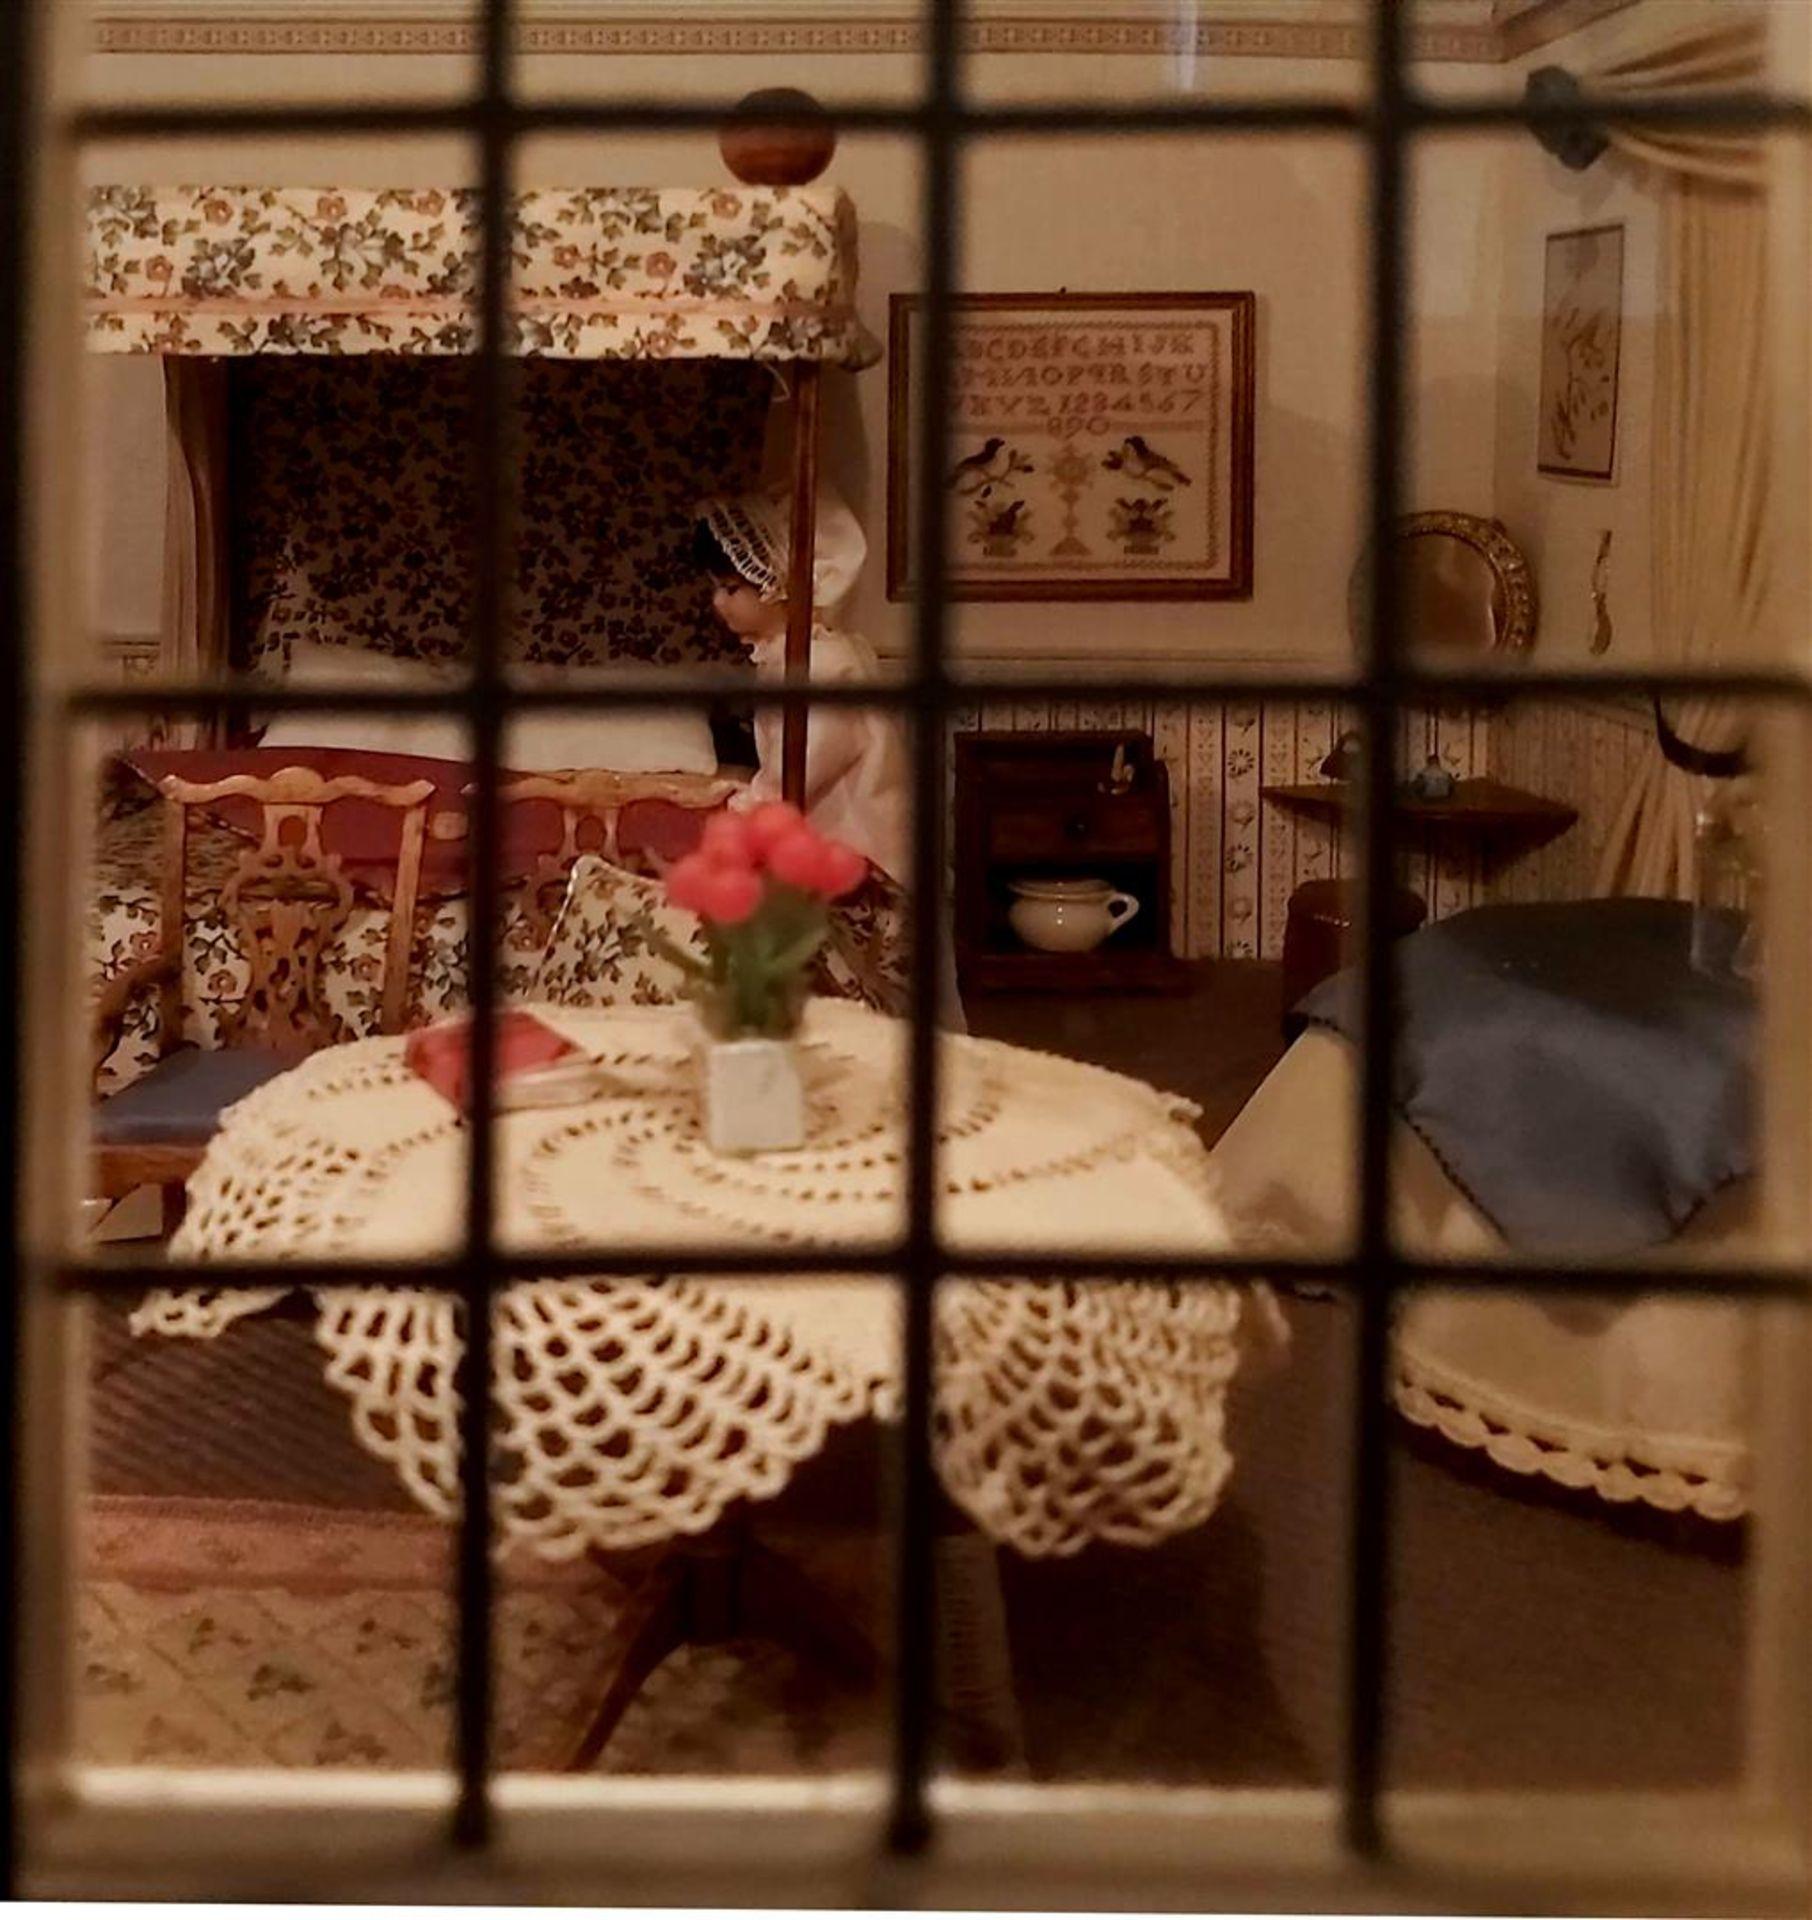 Dollhouse De Kettenborgh by Mrs. J C Wirix Kettenborg - Image 27 of 106